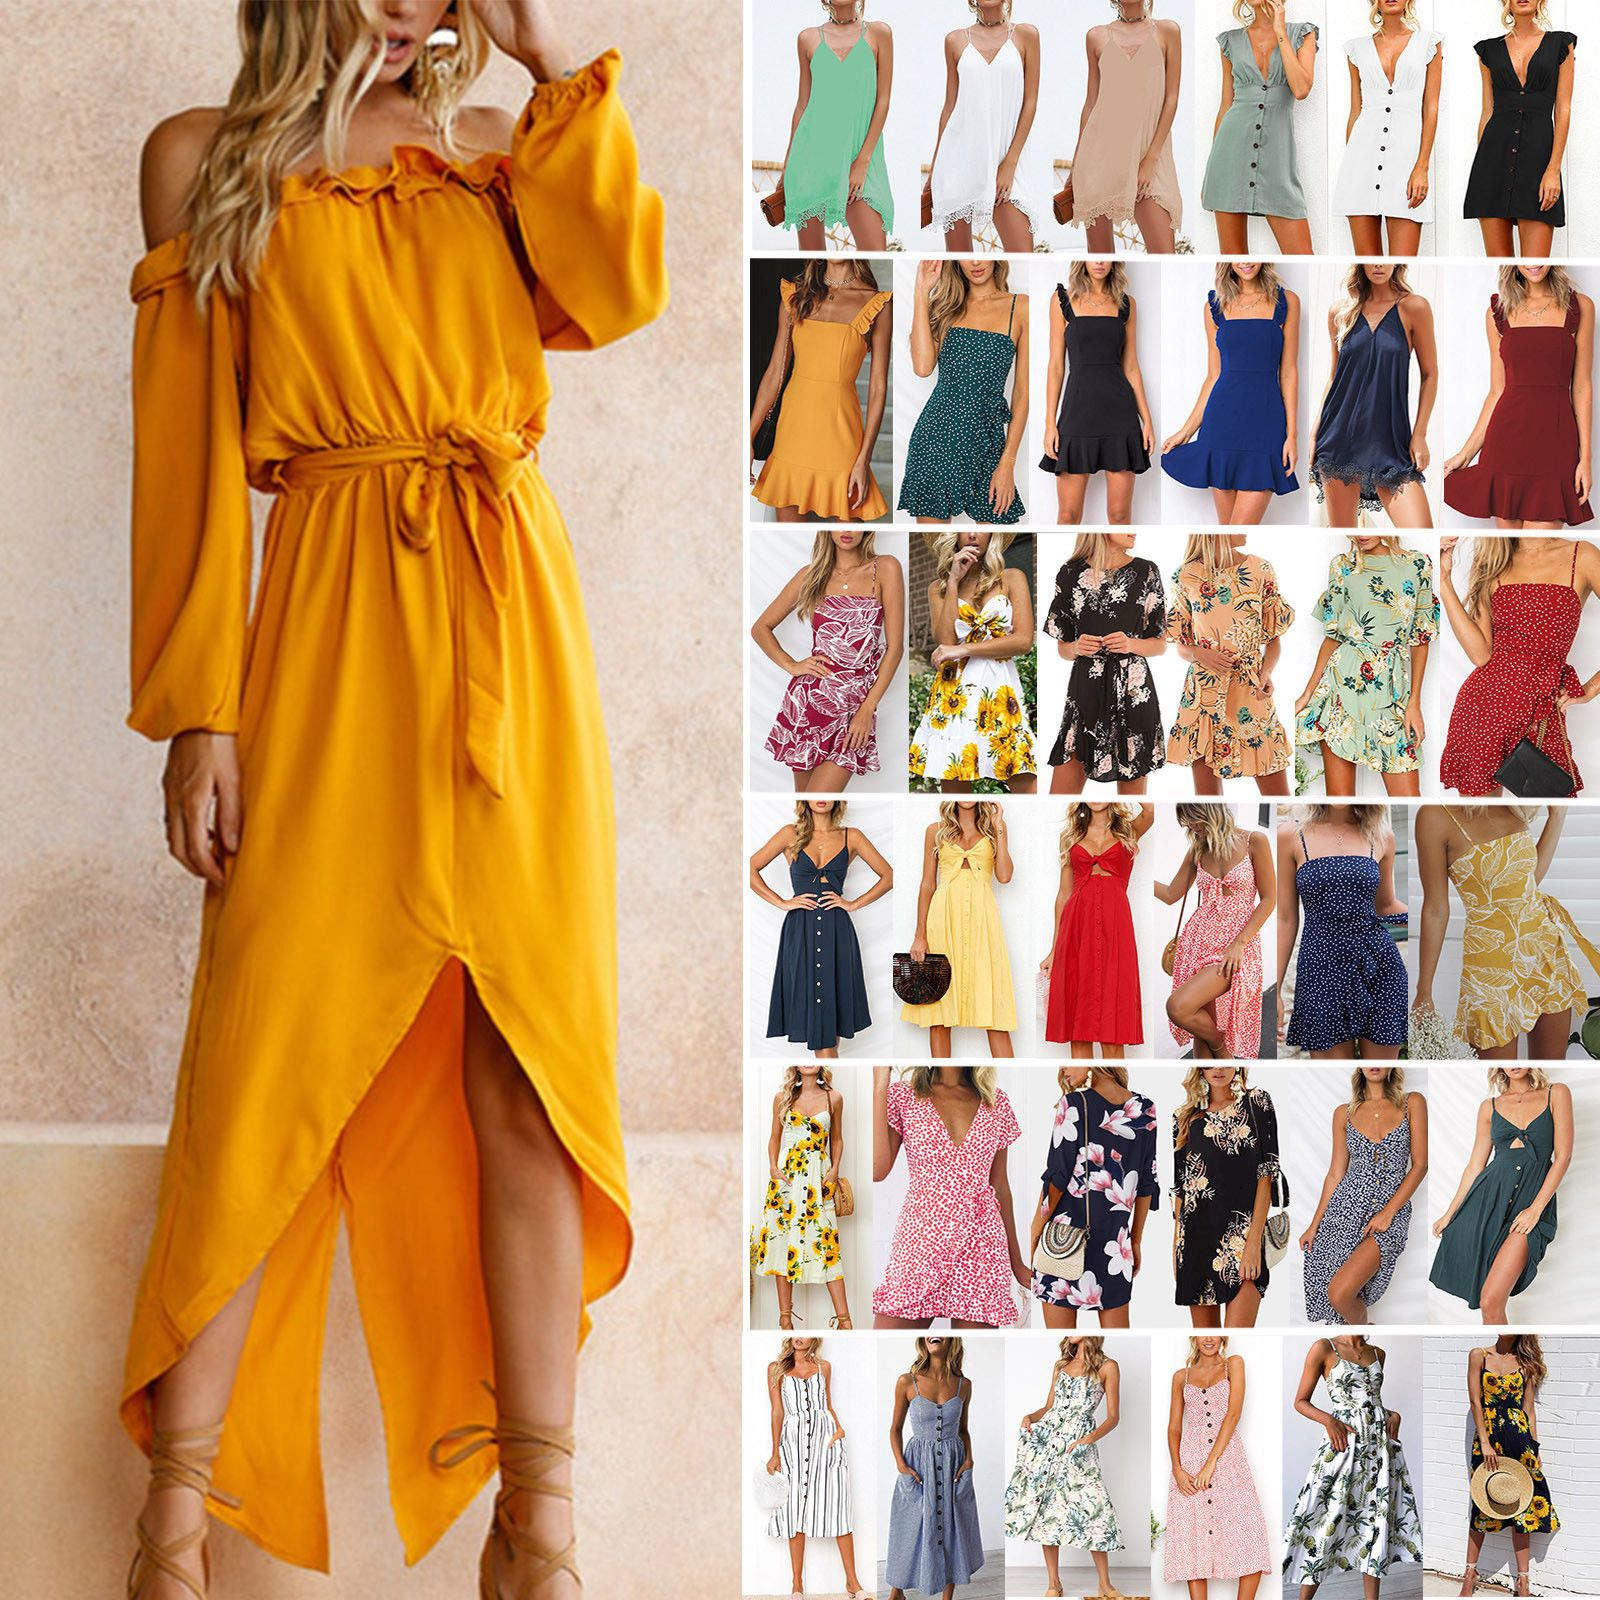 Women Vintage V Neck 1950s Audrey Rockabilly Cocktail Swing Dresses Cap Sleeve Swing Dresses Pleated Party Dress Sleeveless Swing Dress Floral Dress Summer [ 1600 x 1600 Pixel ]